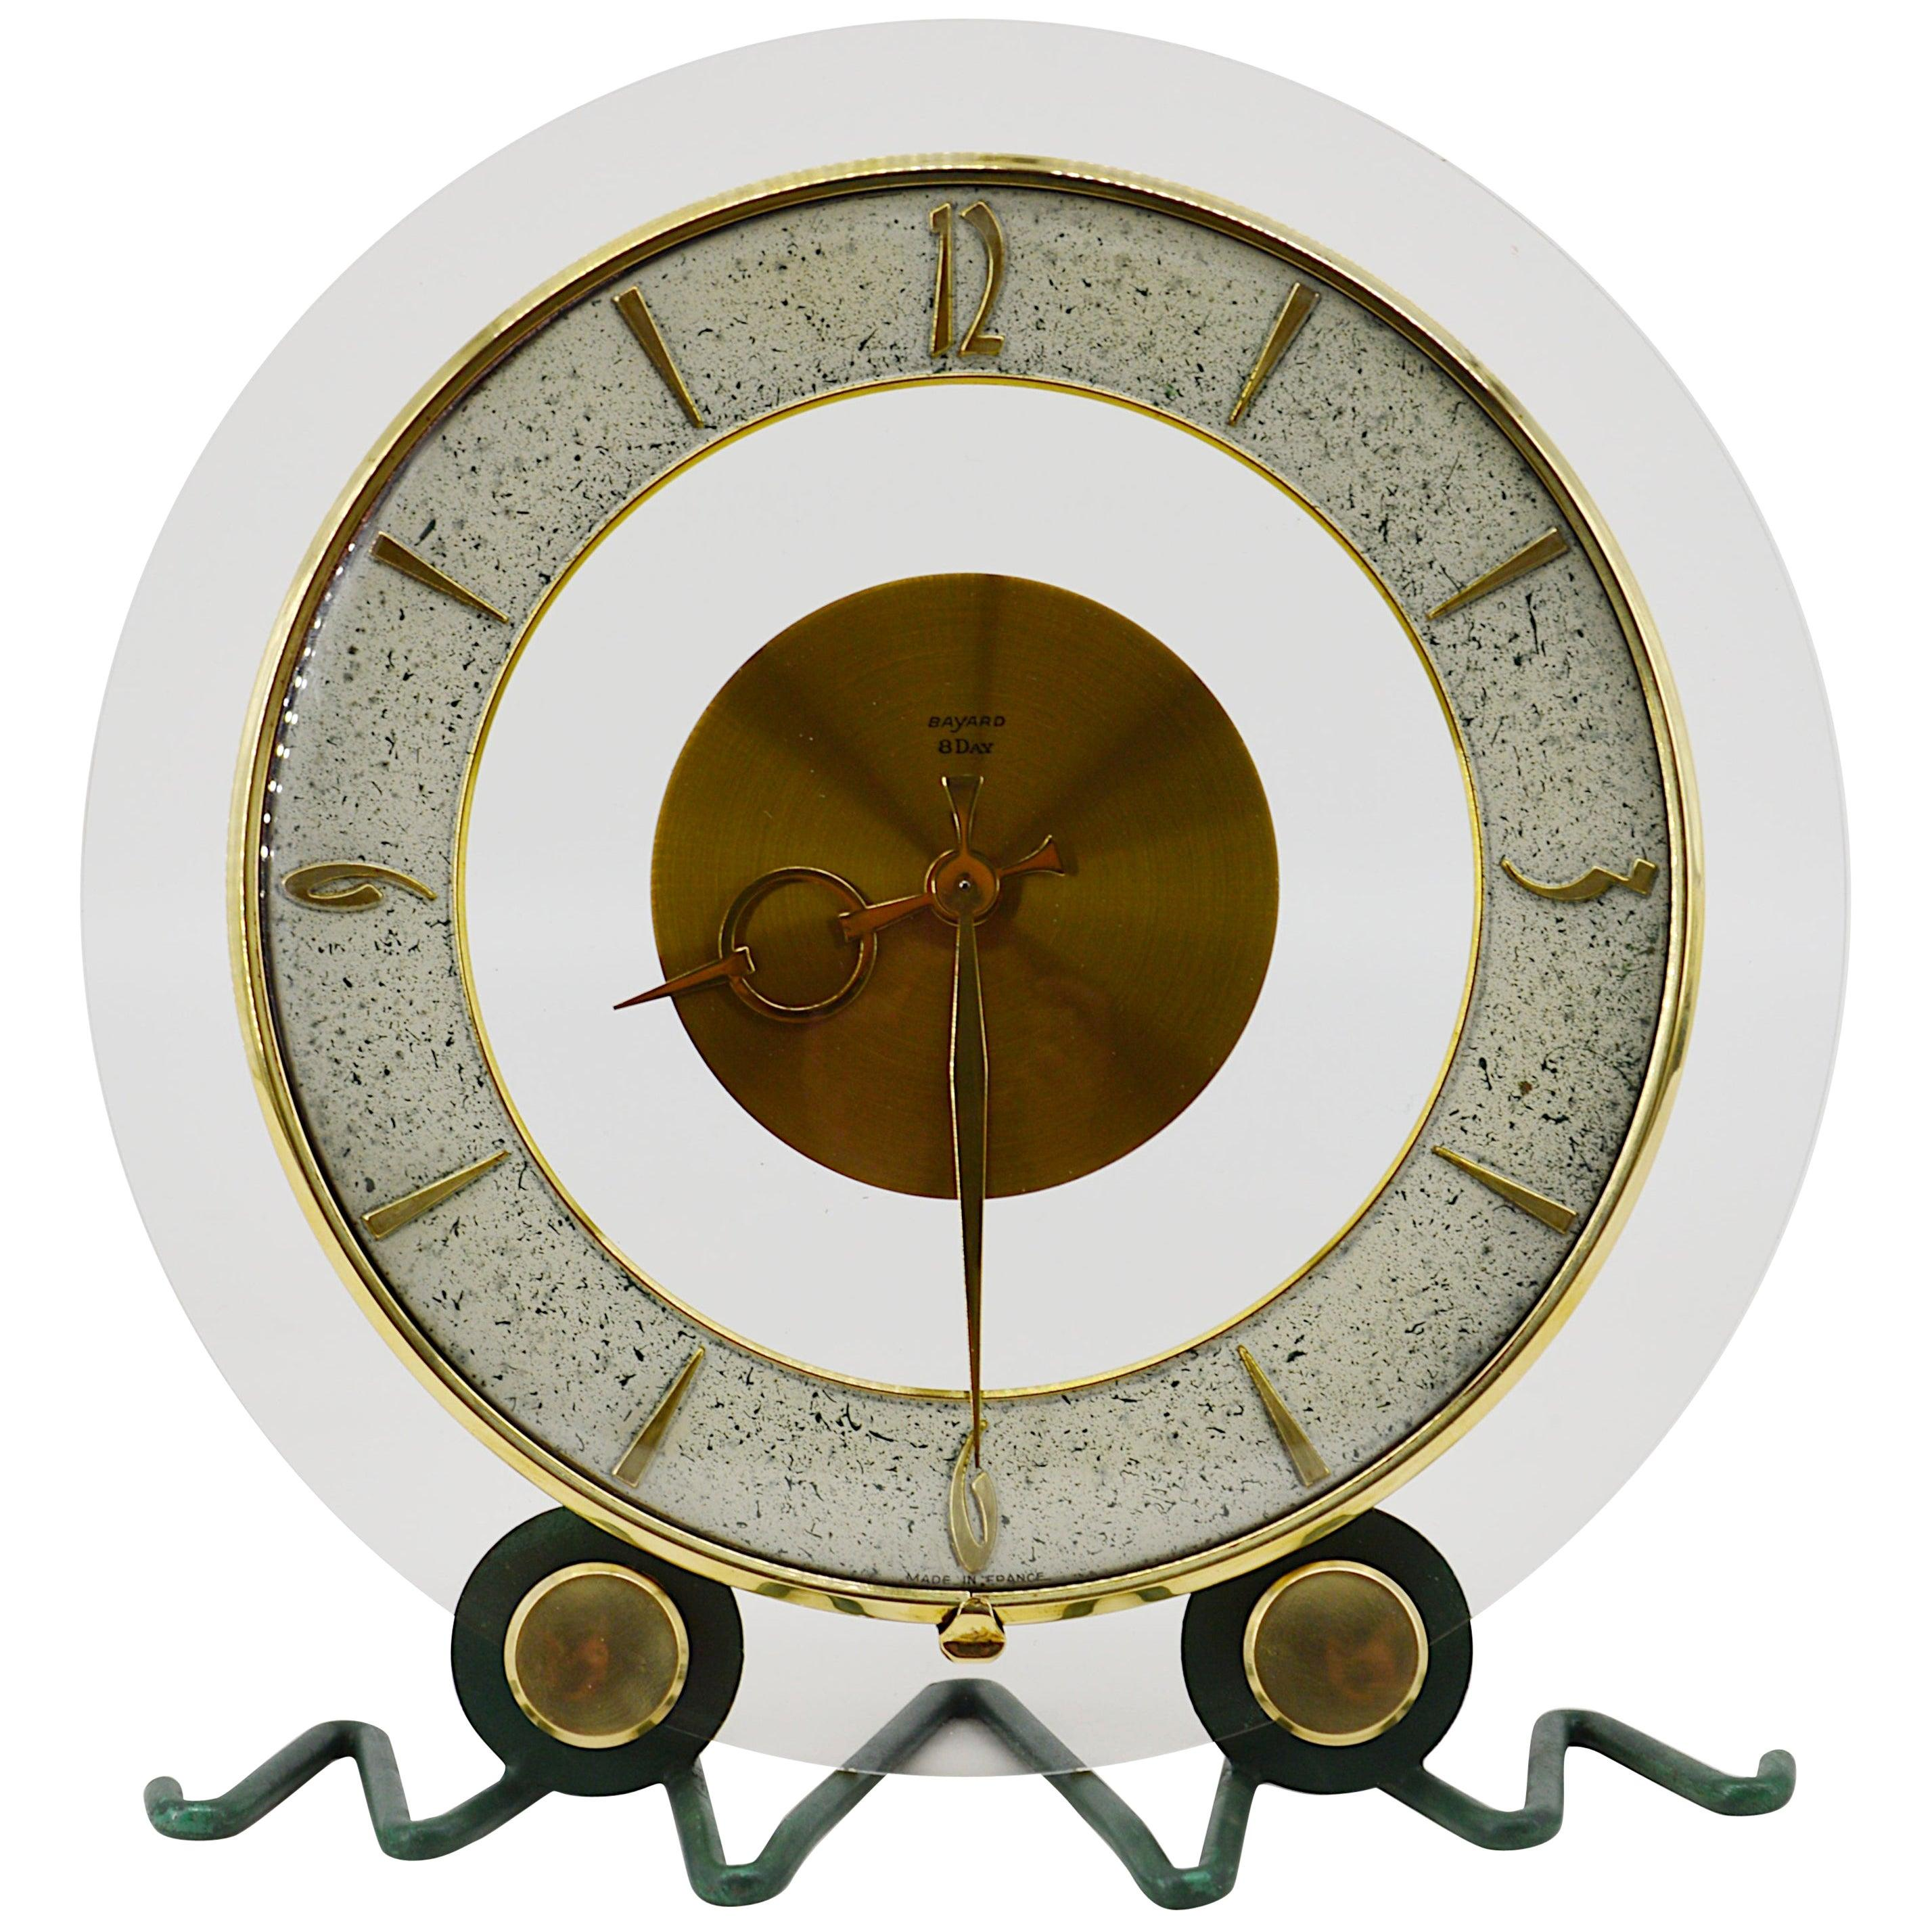 Bayard, French Art Deco Round Clock, 1930s